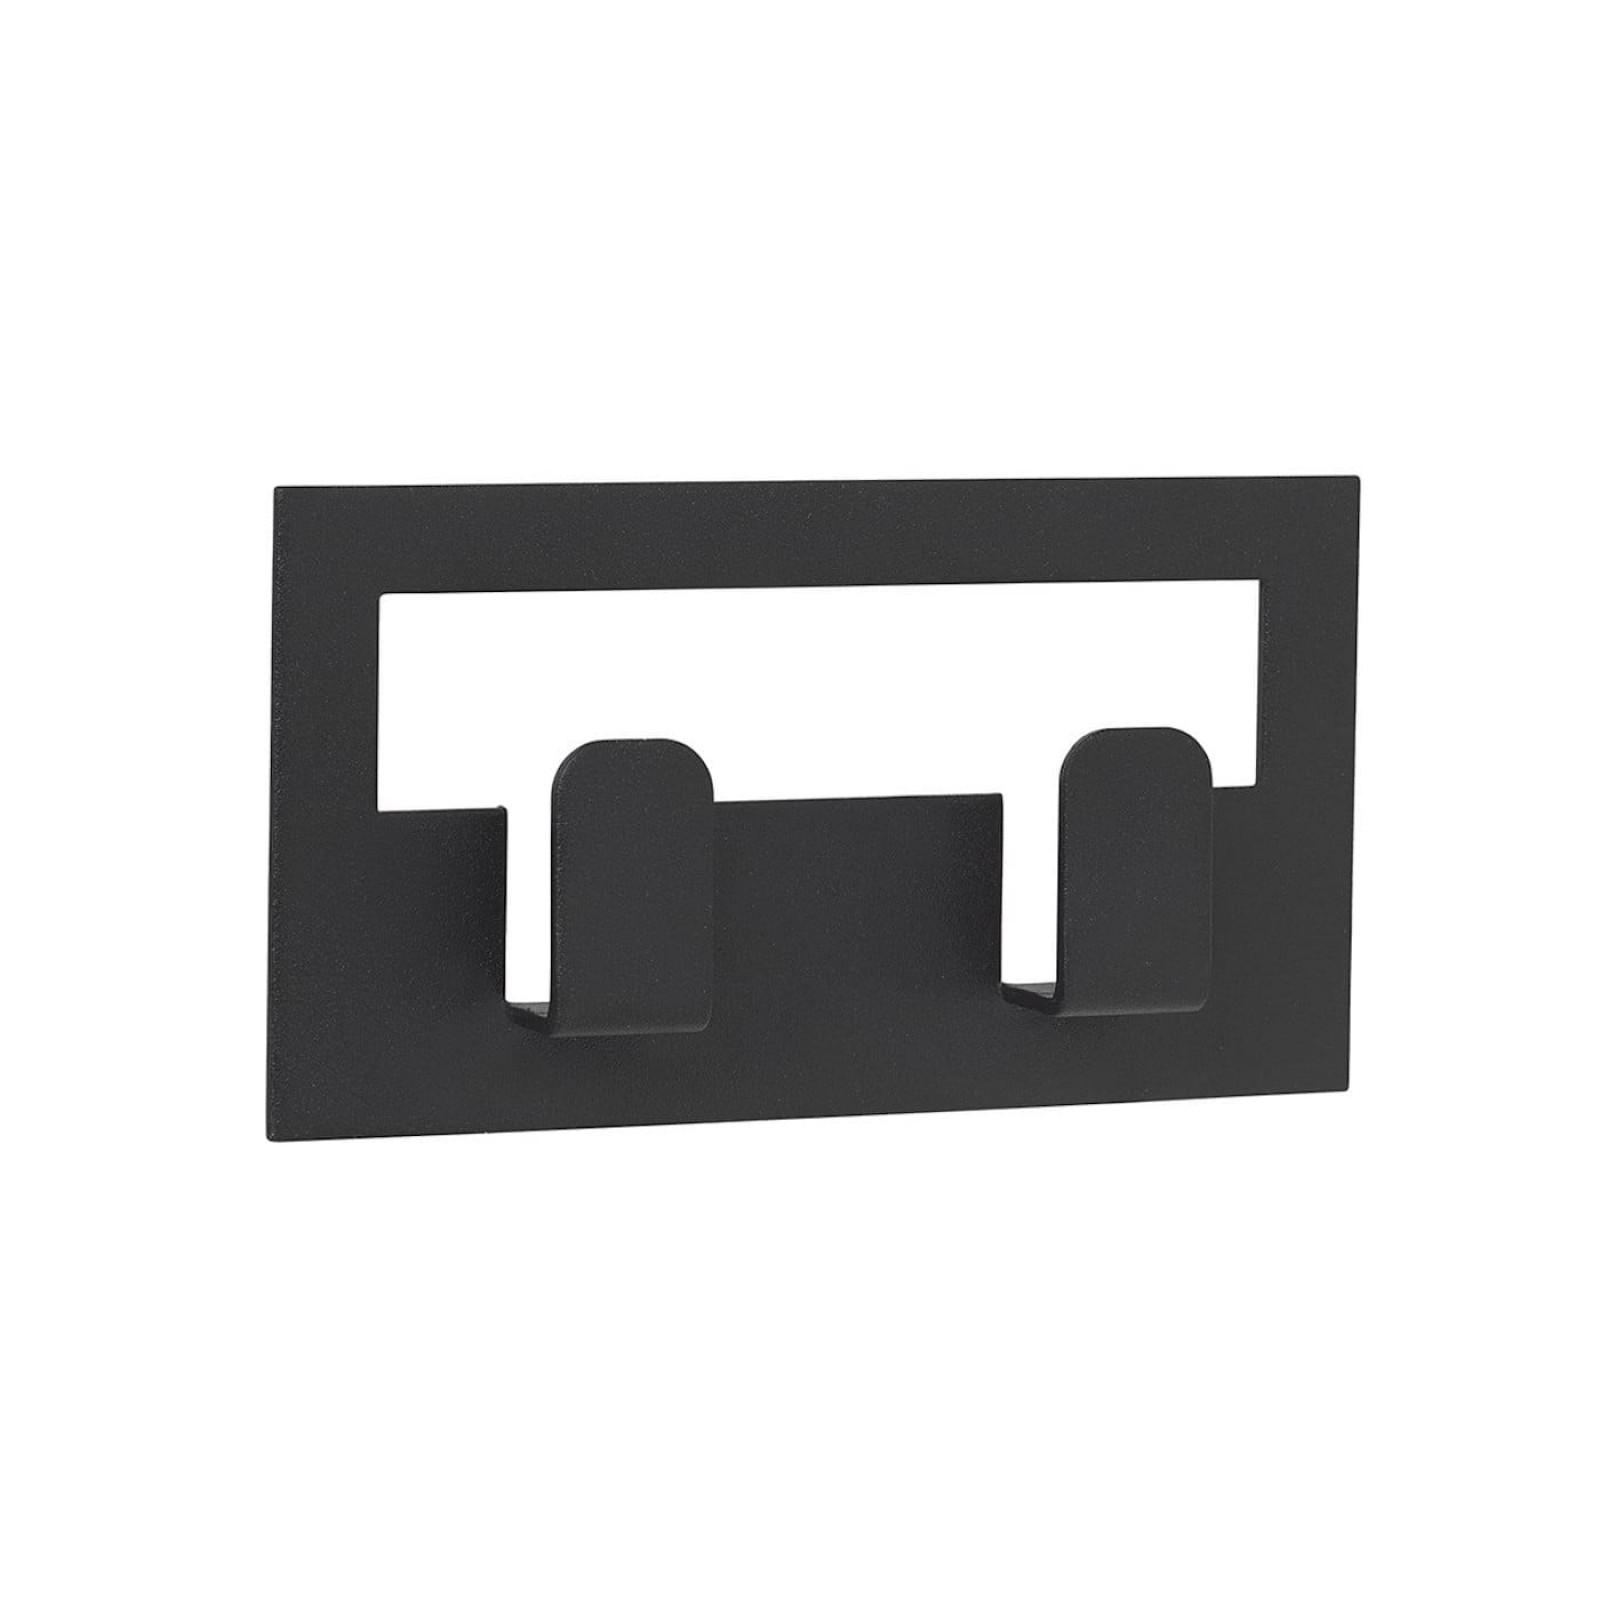 VINDO Double Towel Hook (Black) - Blomus